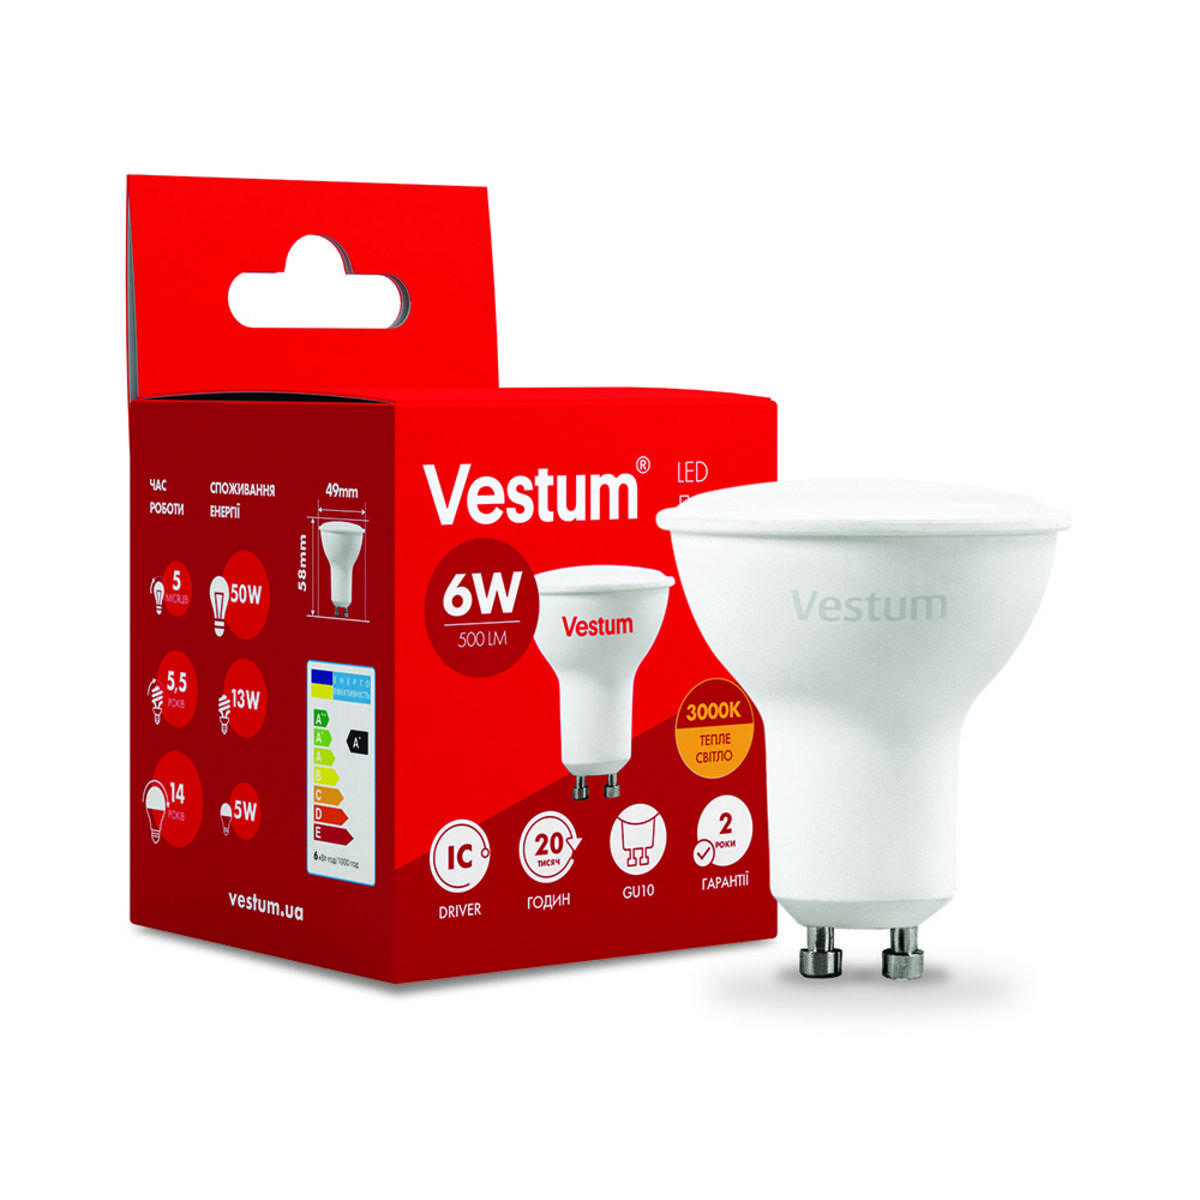 Светодиодная лампа Vestum LED MR16 6W 3000K 220V GU10